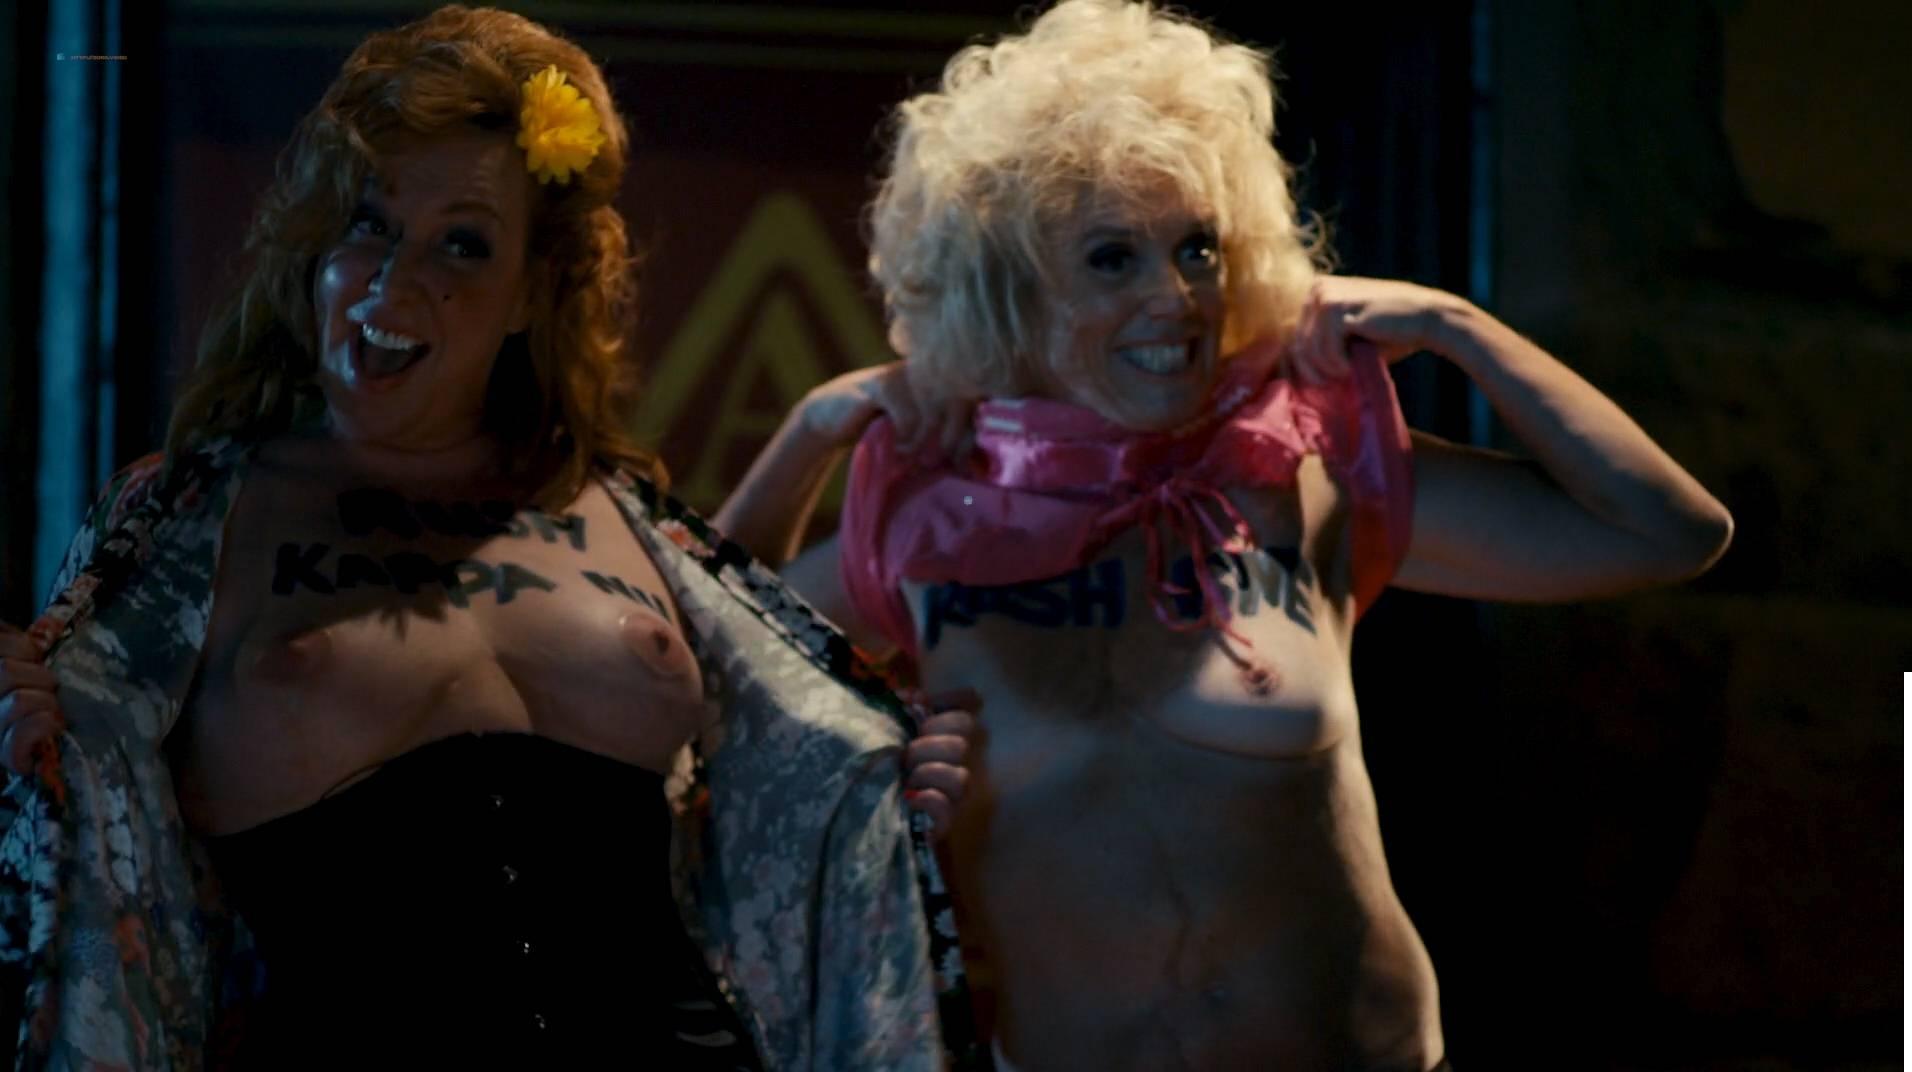 Jennifer Krukowski nude topless Aubrey Ferron and others all nude - Total Frat Movie (2016.) HD 1080p WEB (14)